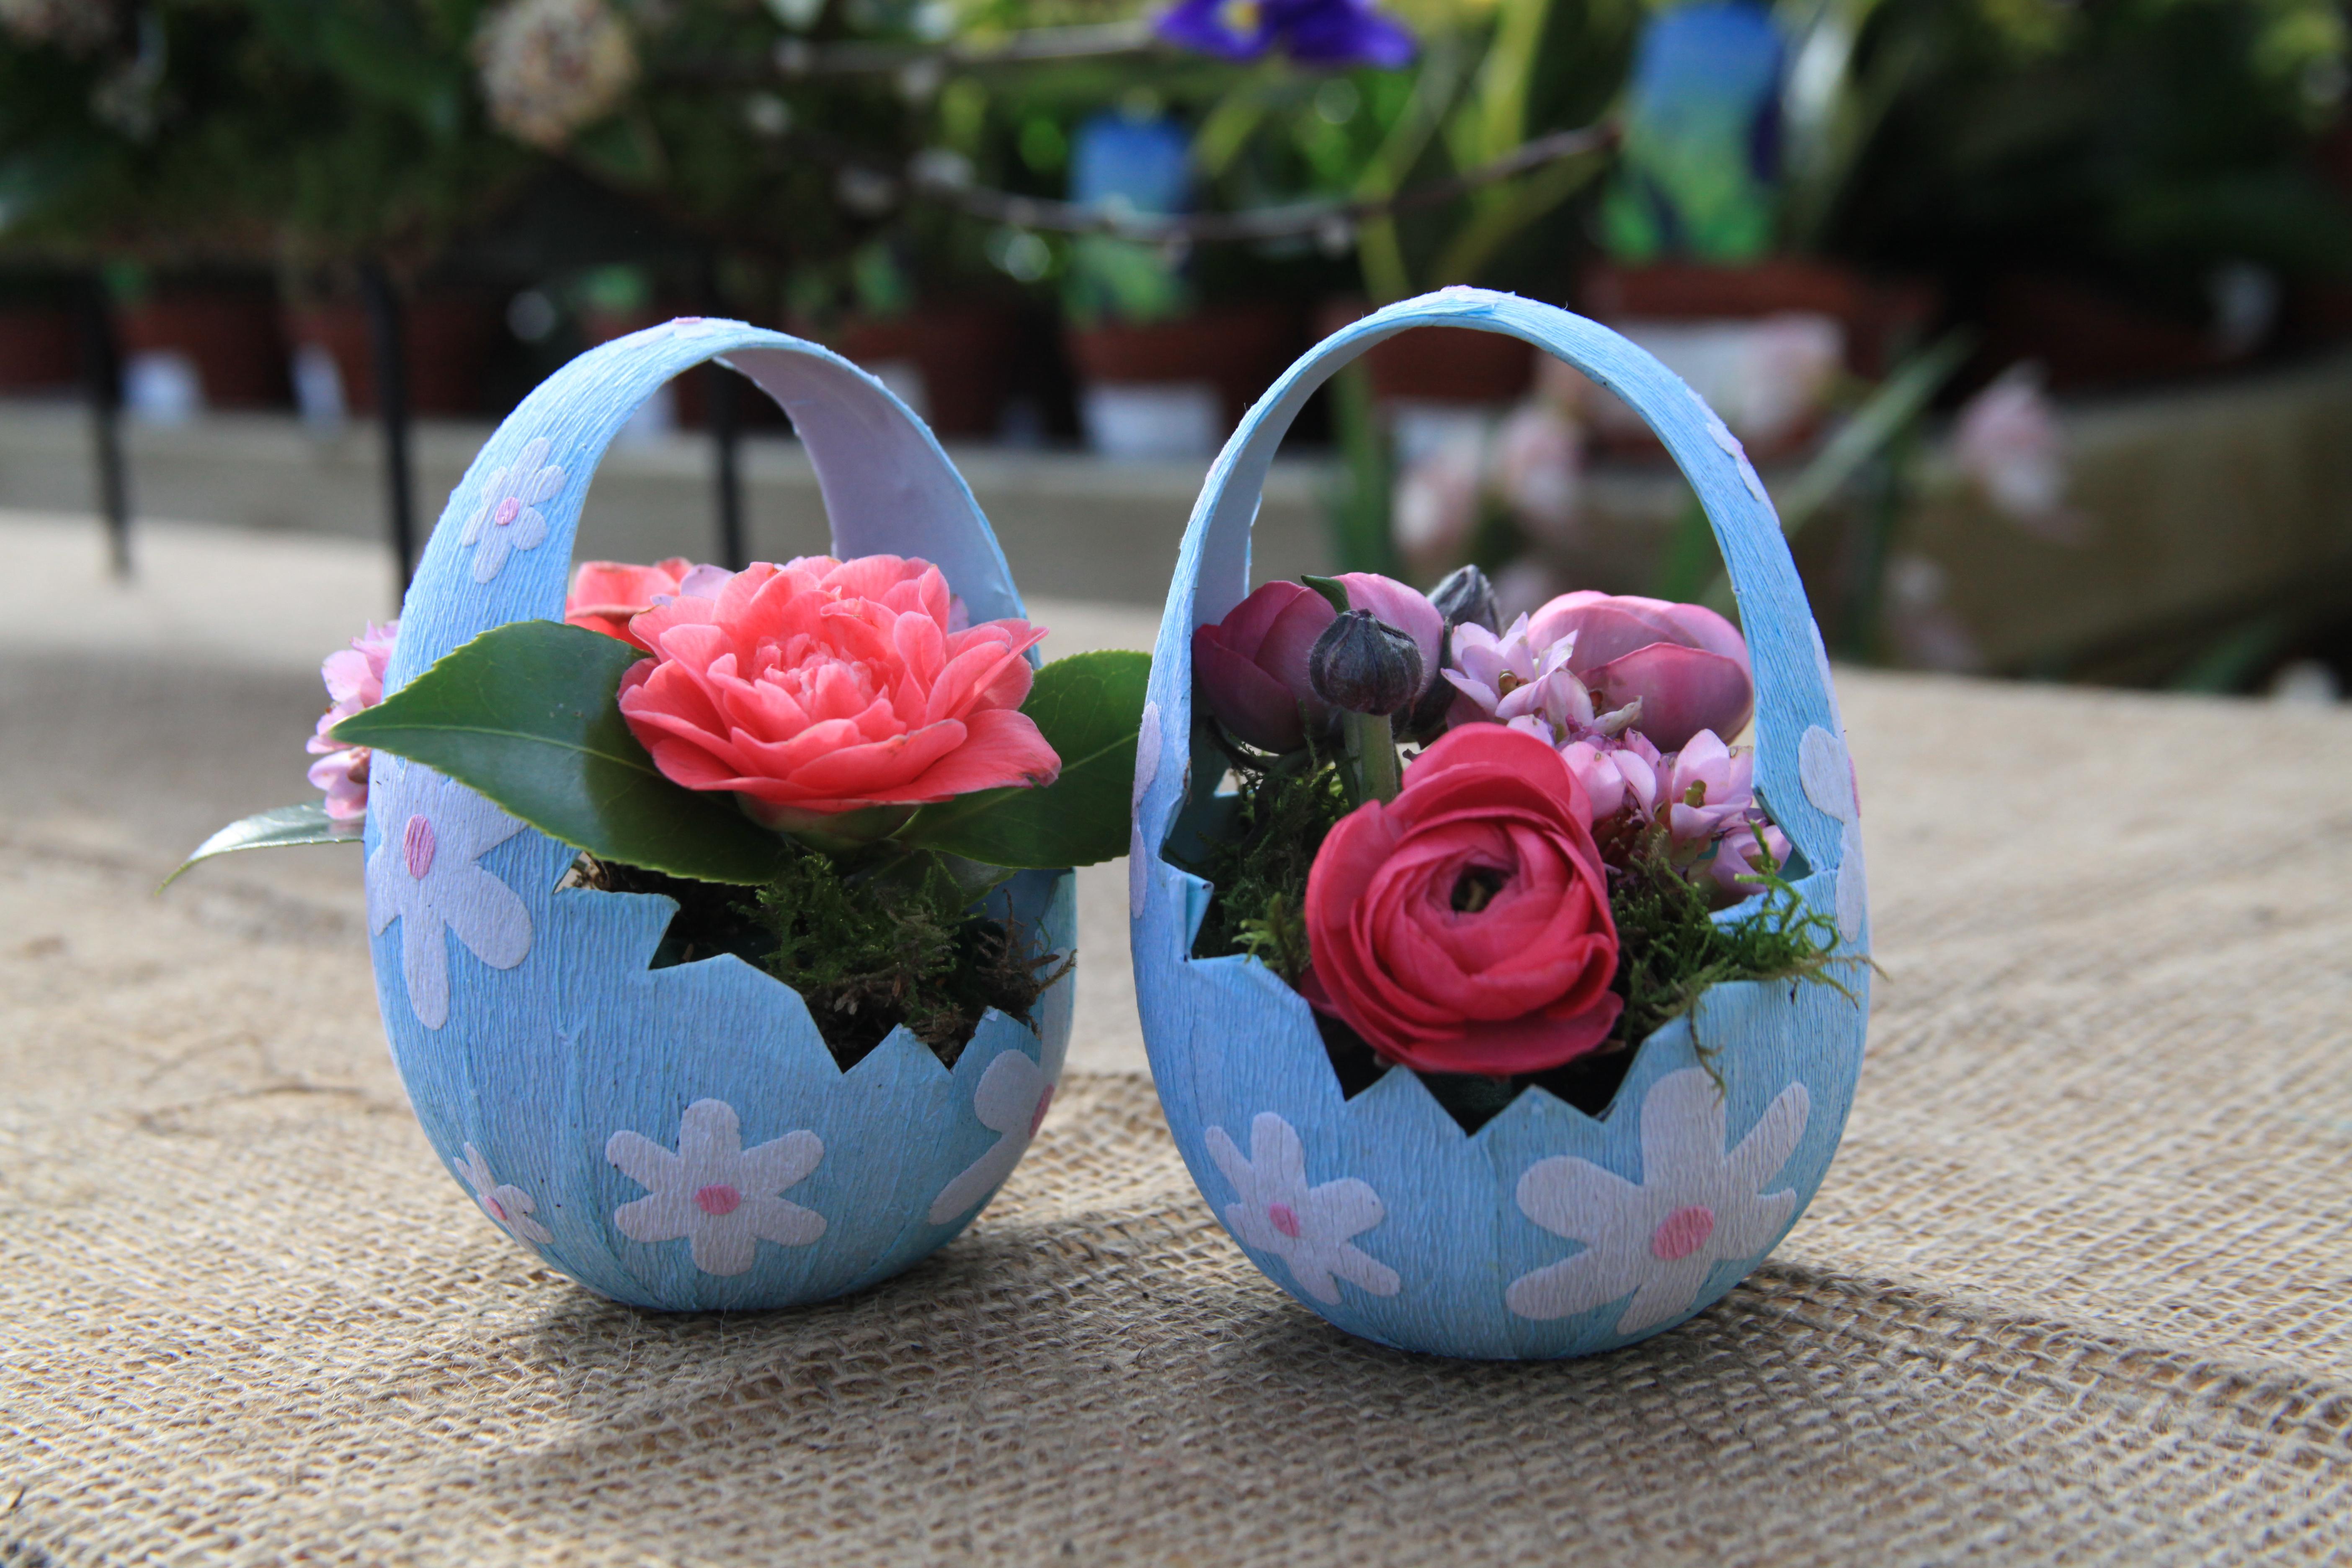 Flower Baskets Dublin : Garden plants powerscourt pavilion